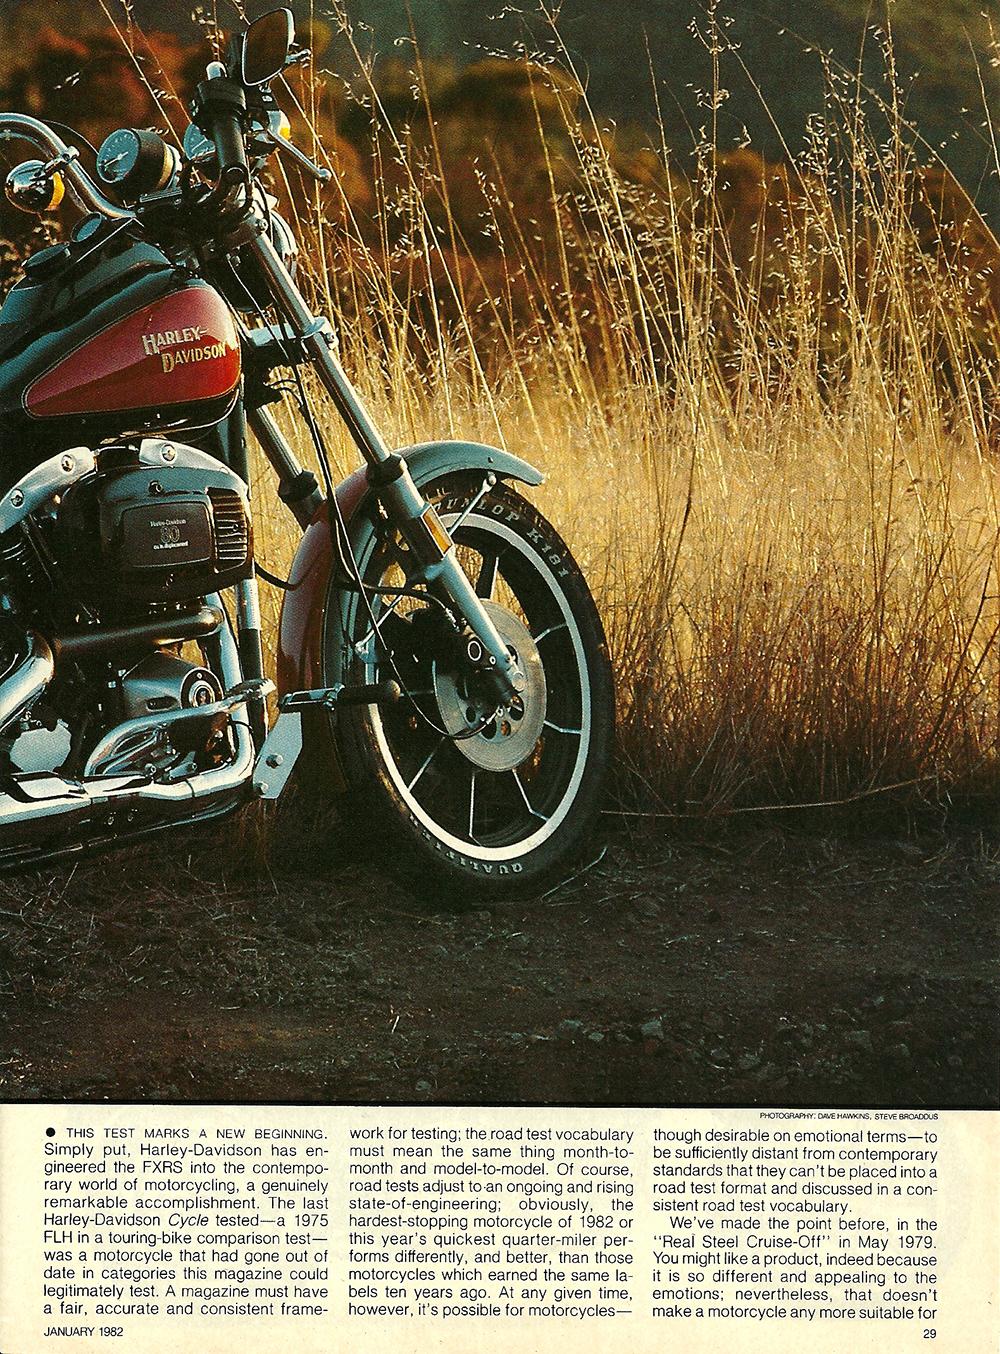 1982 Harley-Davidson FXRS road test 02.jpg